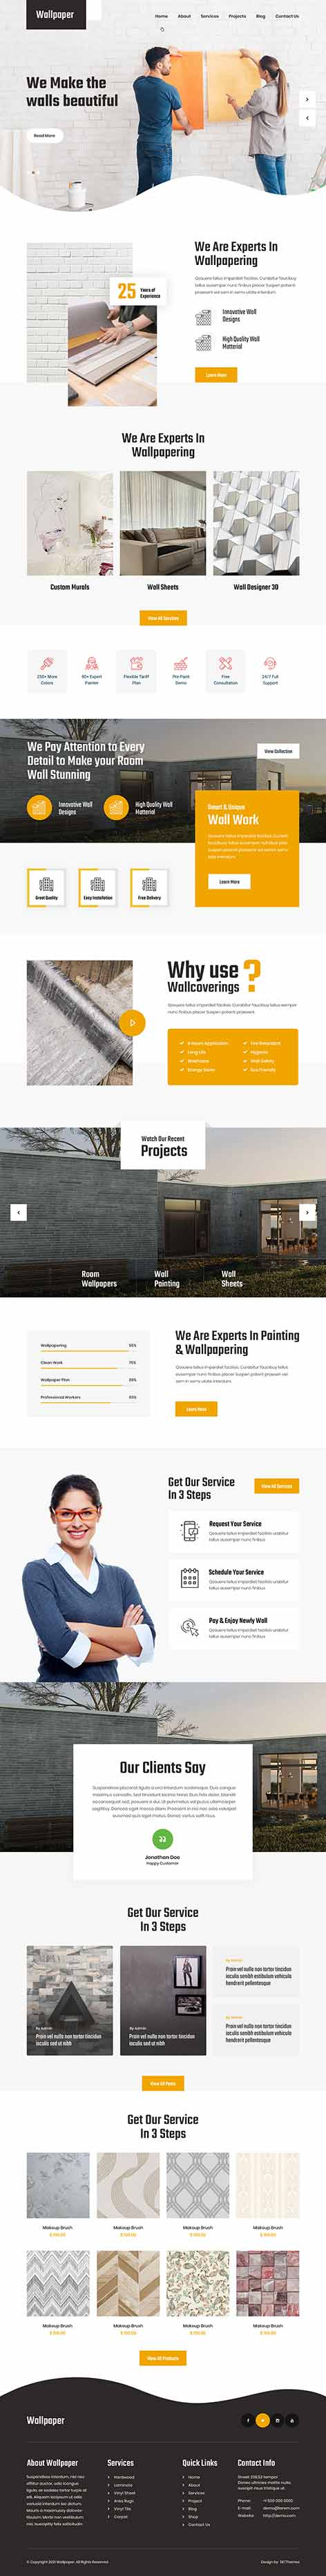 wallpaper design WordPress theme